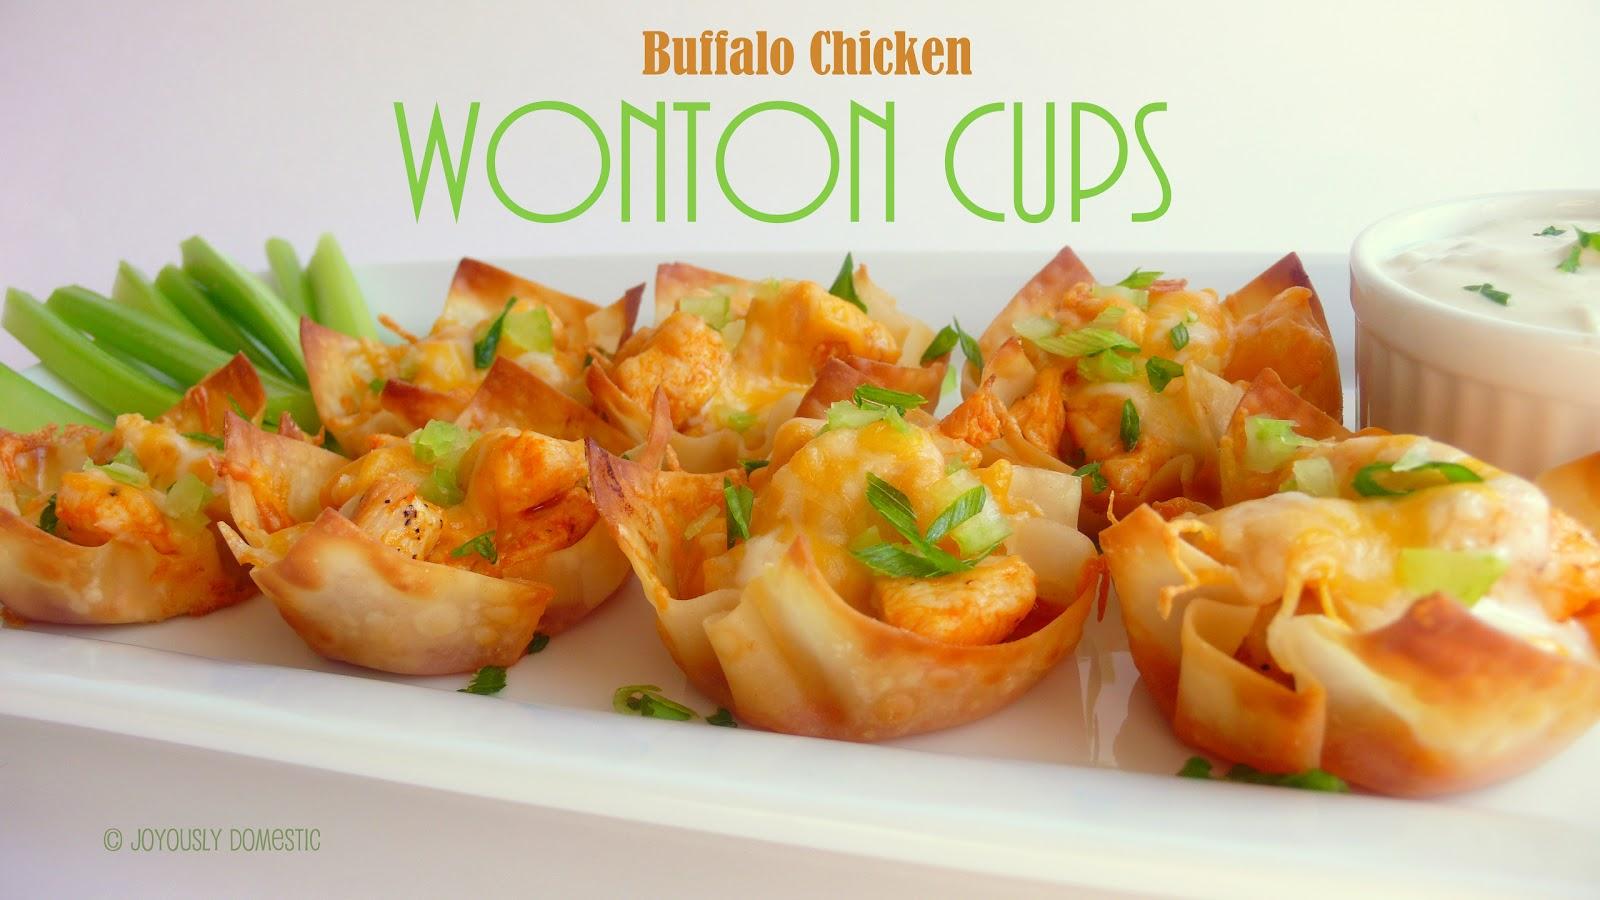 Spicy Crab In Wonton Cups Recipes — Dishmaps